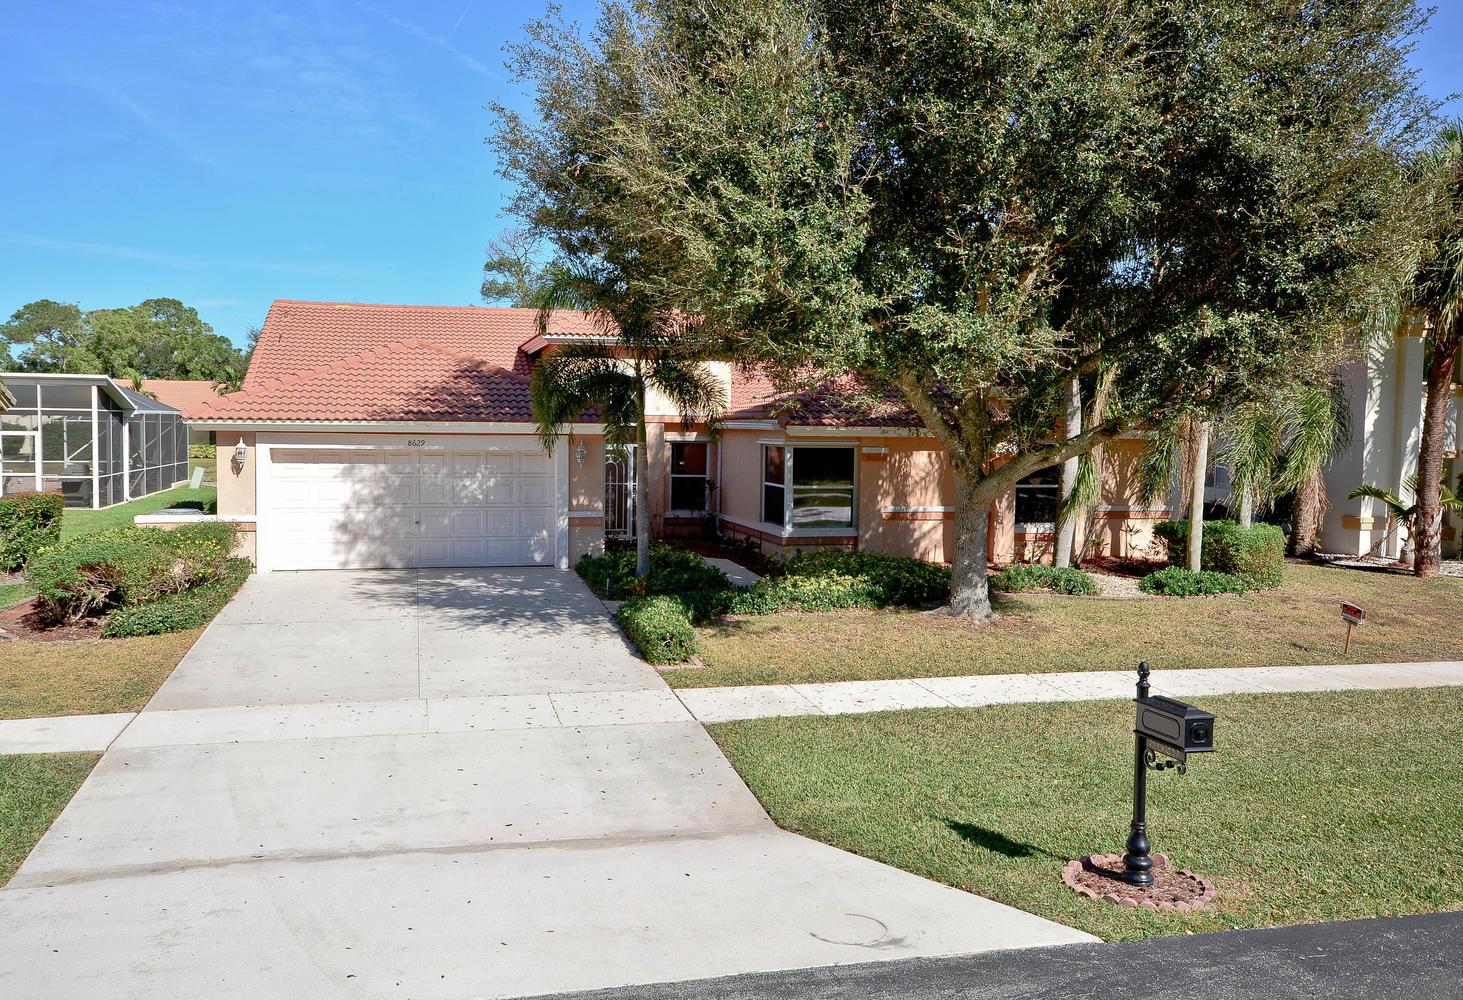 Photo of 8629 Cypress Springs Road, Lake Worth, FL 33467